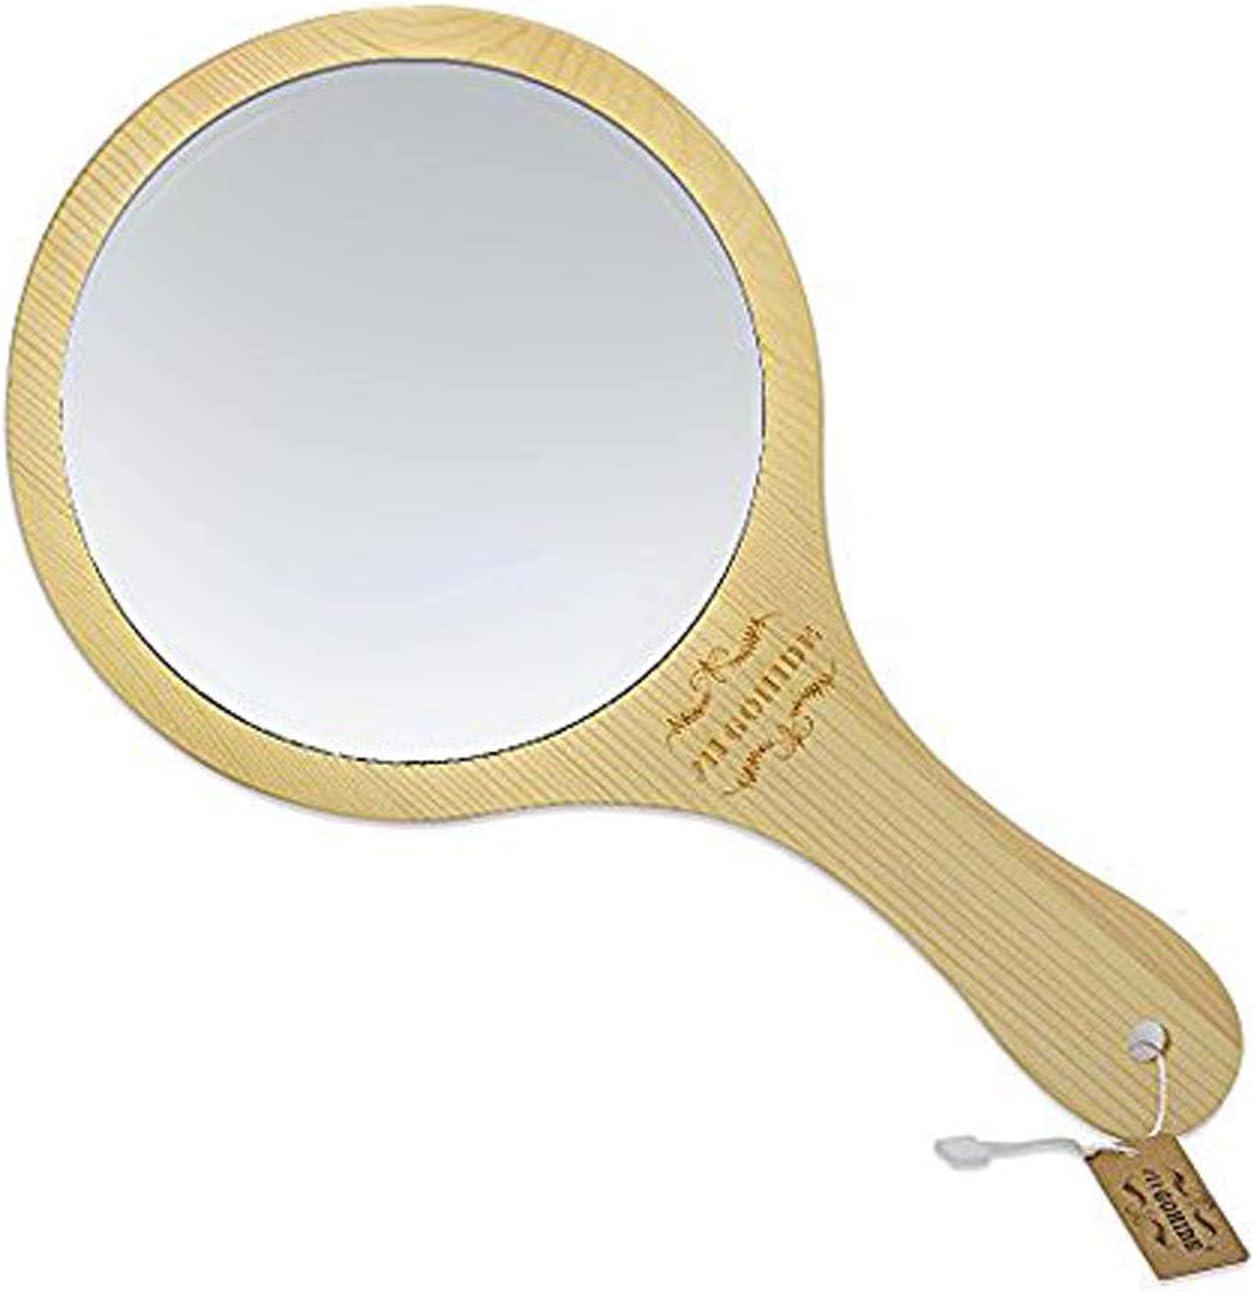 GOHIDE Handmade Portable Handle Round Cosmetic Mirror Wooden Makeup Portable Mirror Beauty Vanity Decorative Wood Mirrors HSU